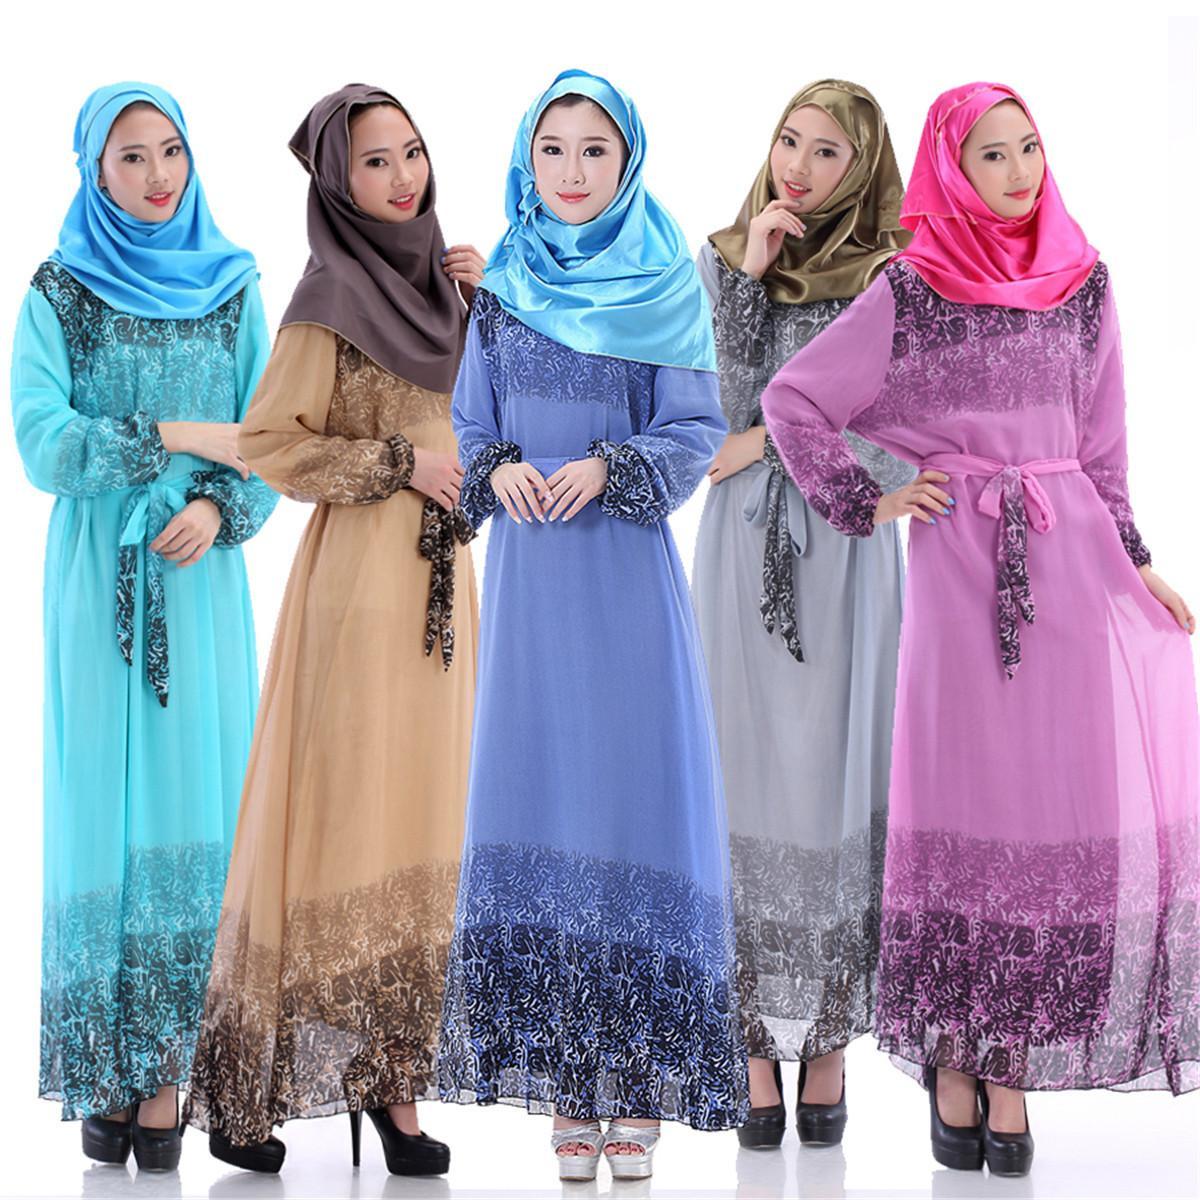 2016 Fashion Muslim Dridesmaid Dresses Sequins Arab Women Robes Long  Sleeves Islamic Ethnic Clothing Middle East Casual Dress E303J Long Dresses  Women ... 8df8e69b0